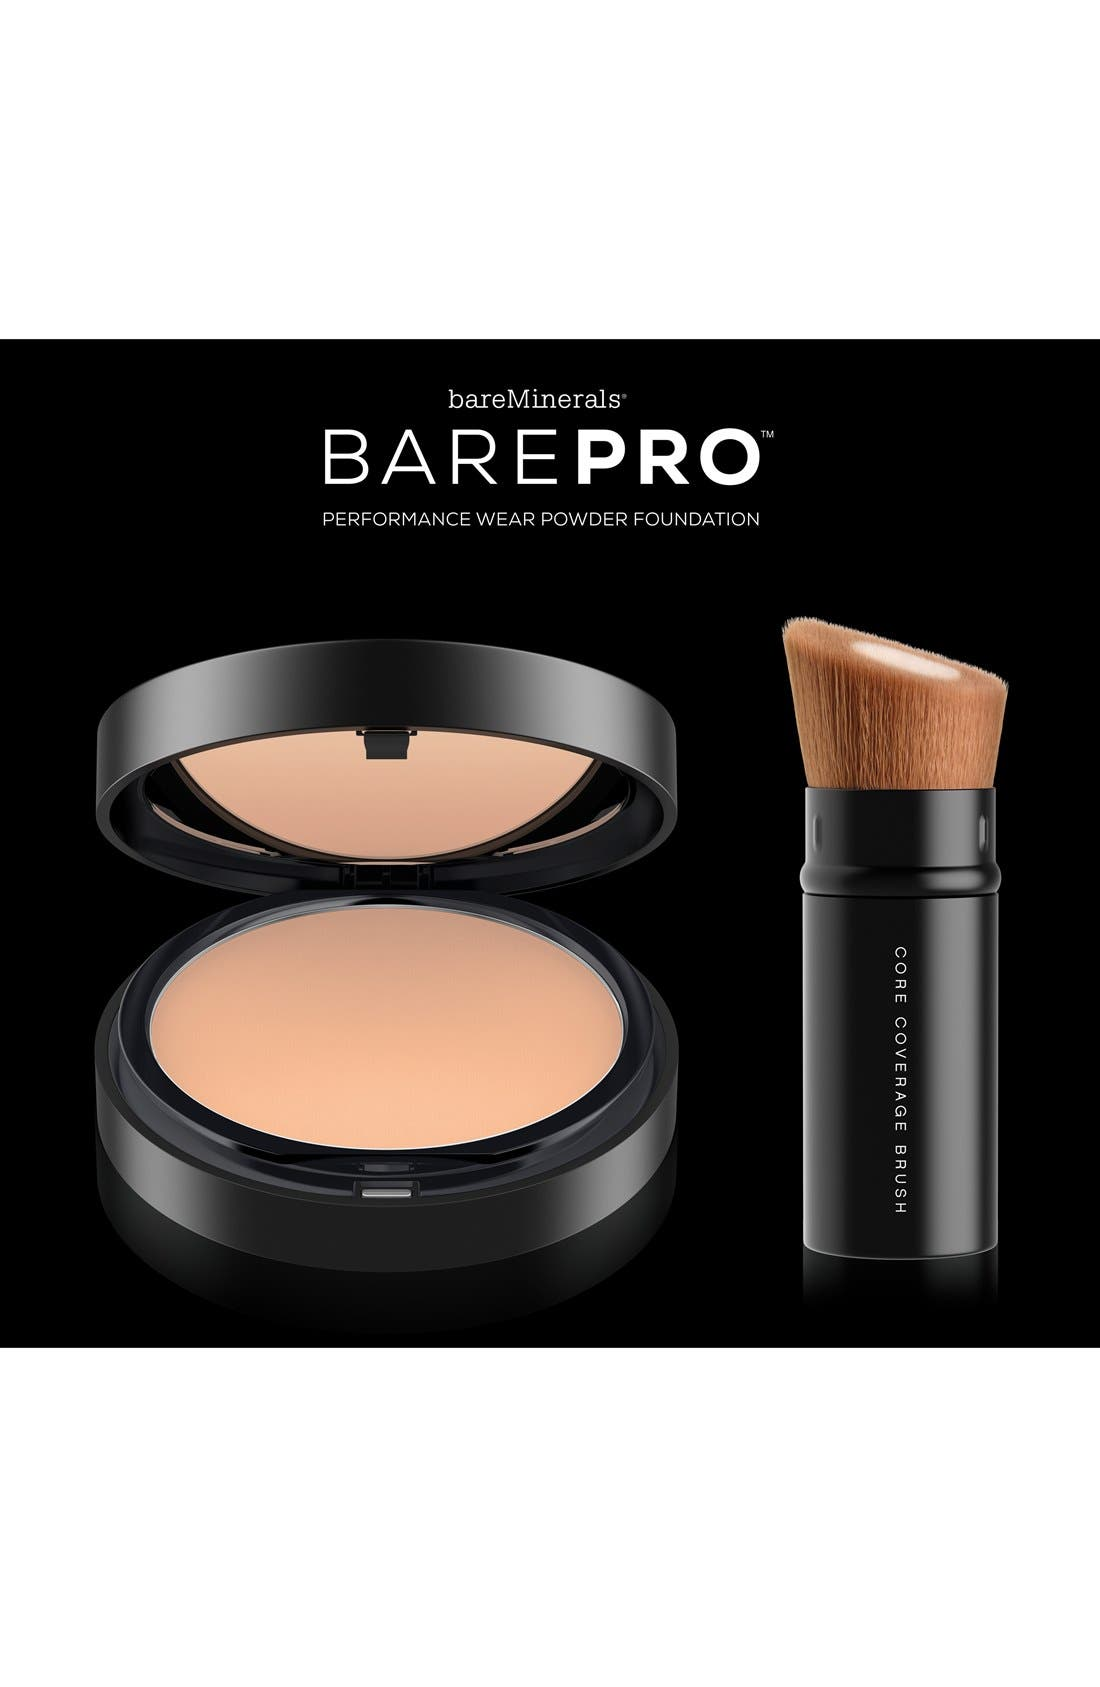 barePro<sup>™</sup> Performance Wear Powder Foundation,                             Alternate thumbnail 4, color,                             28 CLOVE